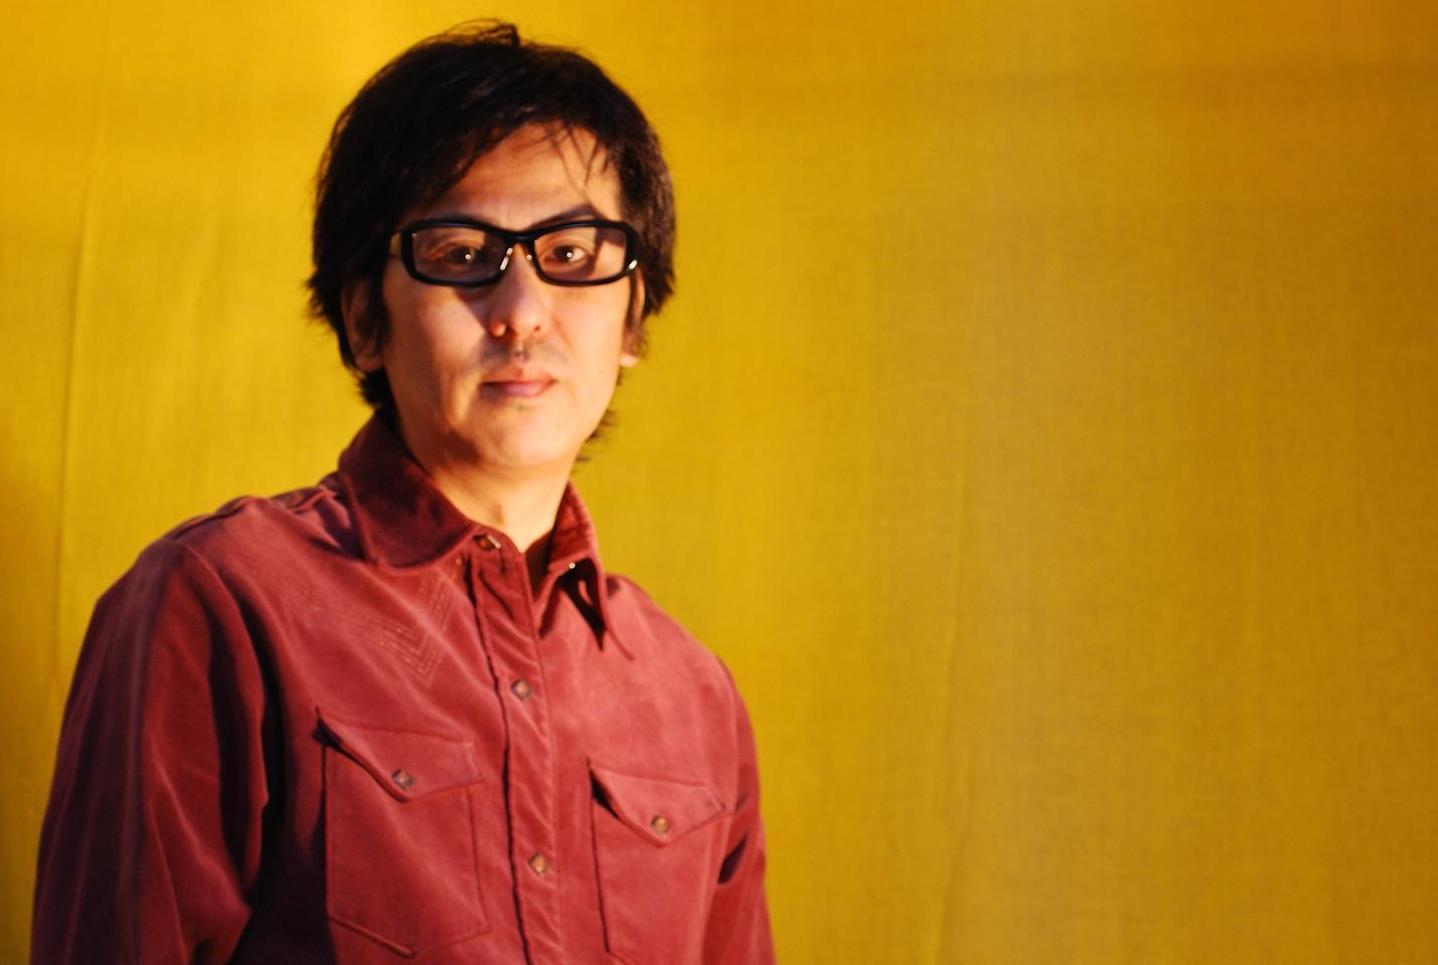 R.I.P. Electronic Composer Susumu Yokota